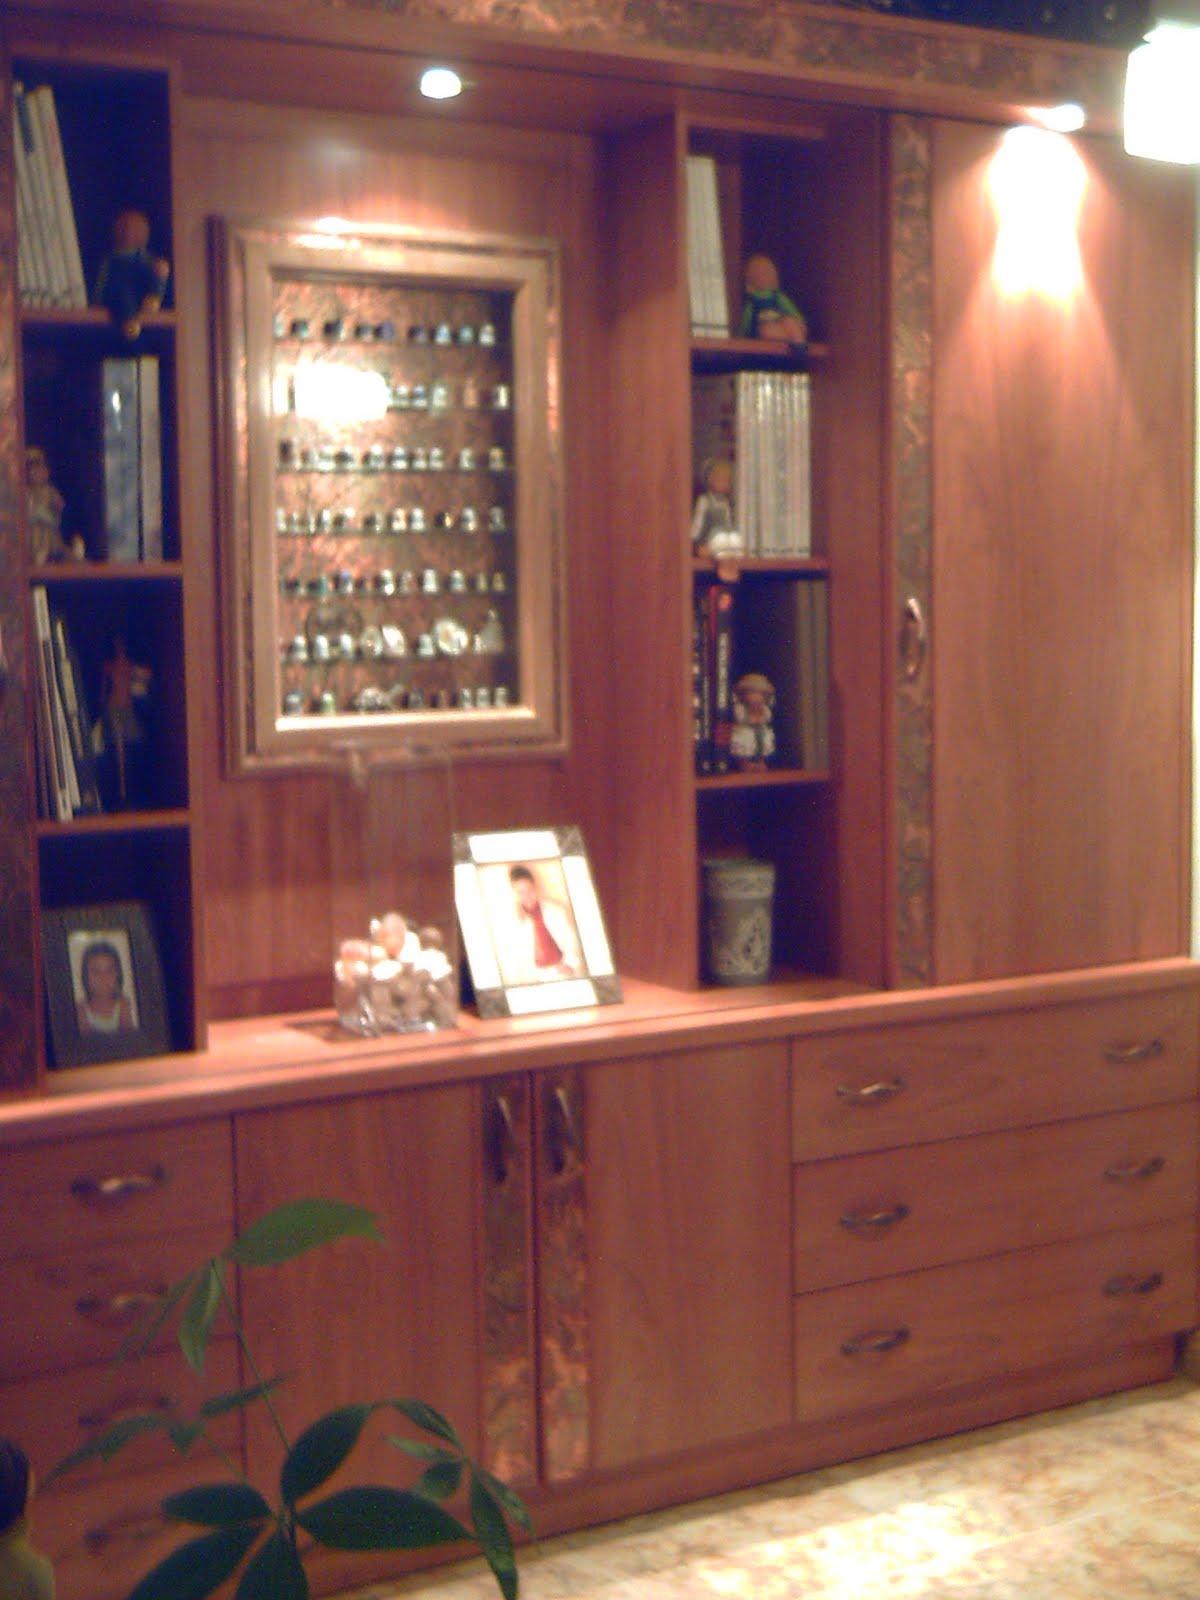 Ca uelo e hijos carpinteria s c p muebles para comedor sal n for El mueble salon comedor